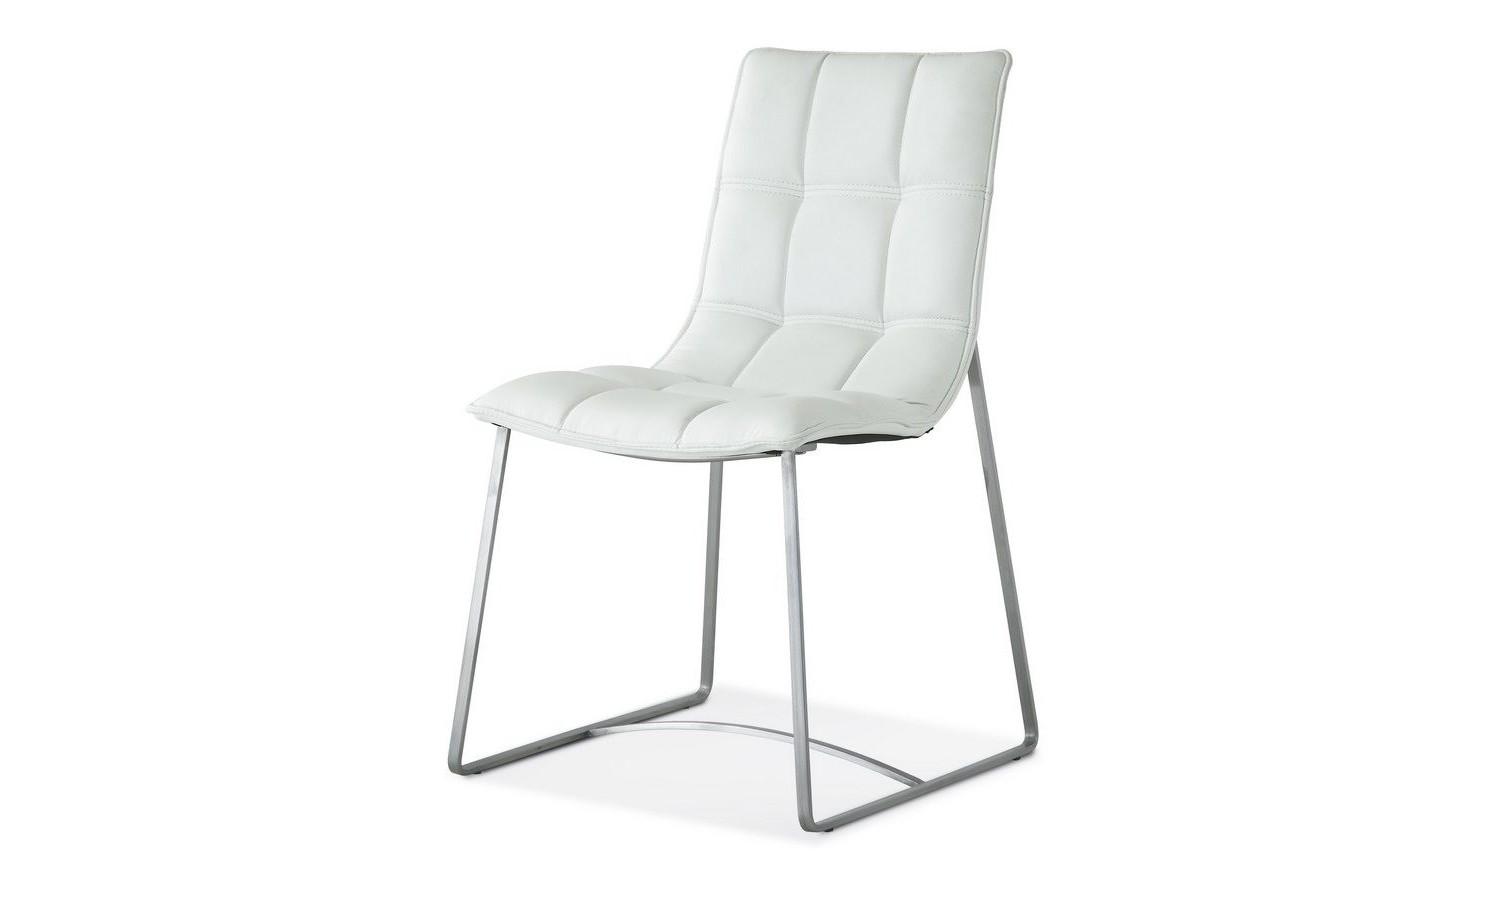 Europe Style Стул BZ-500S белый europe style стол dt 903 белый